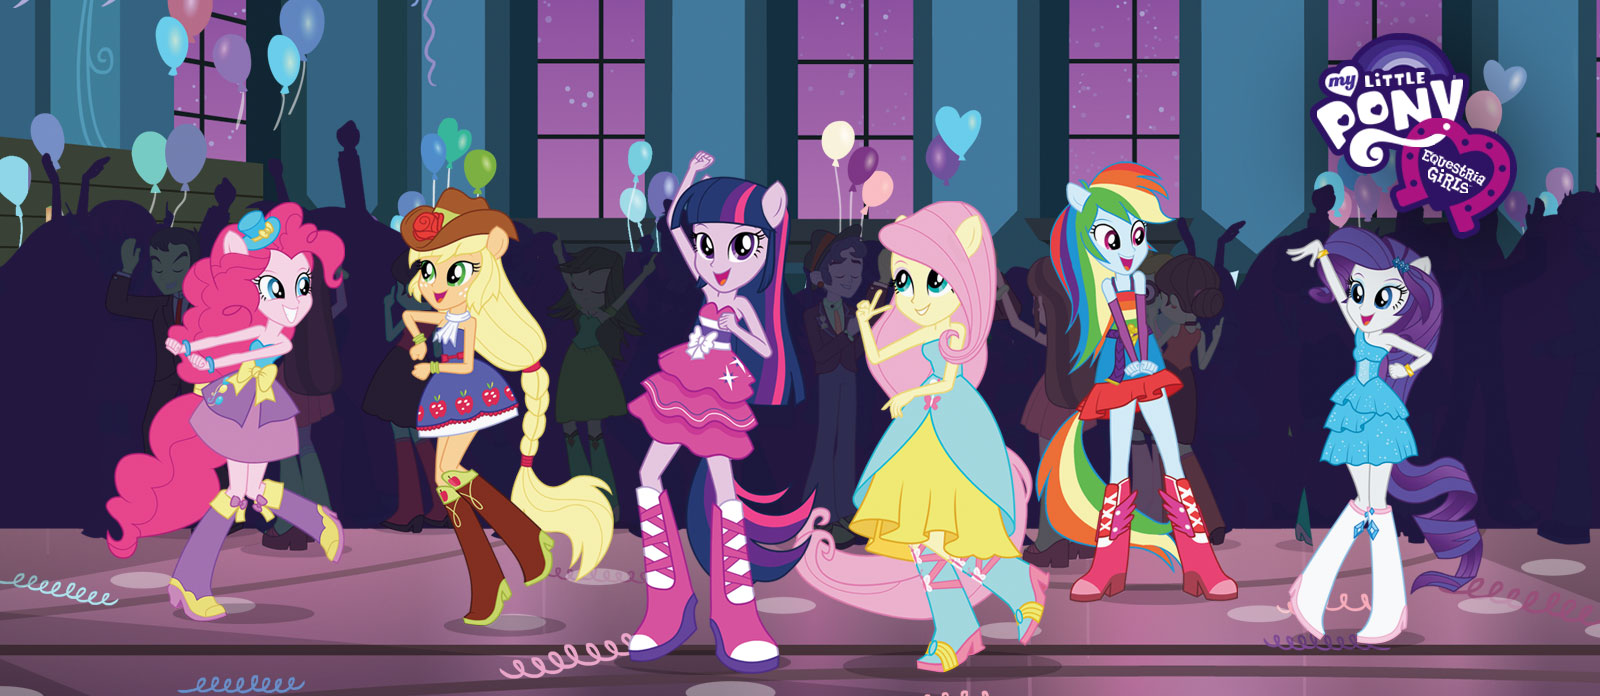 Hasbro My Little Pony B1771 Май Литл Пони Equestria Girls Кукла спорт Вондеркольты (в ассортименте)